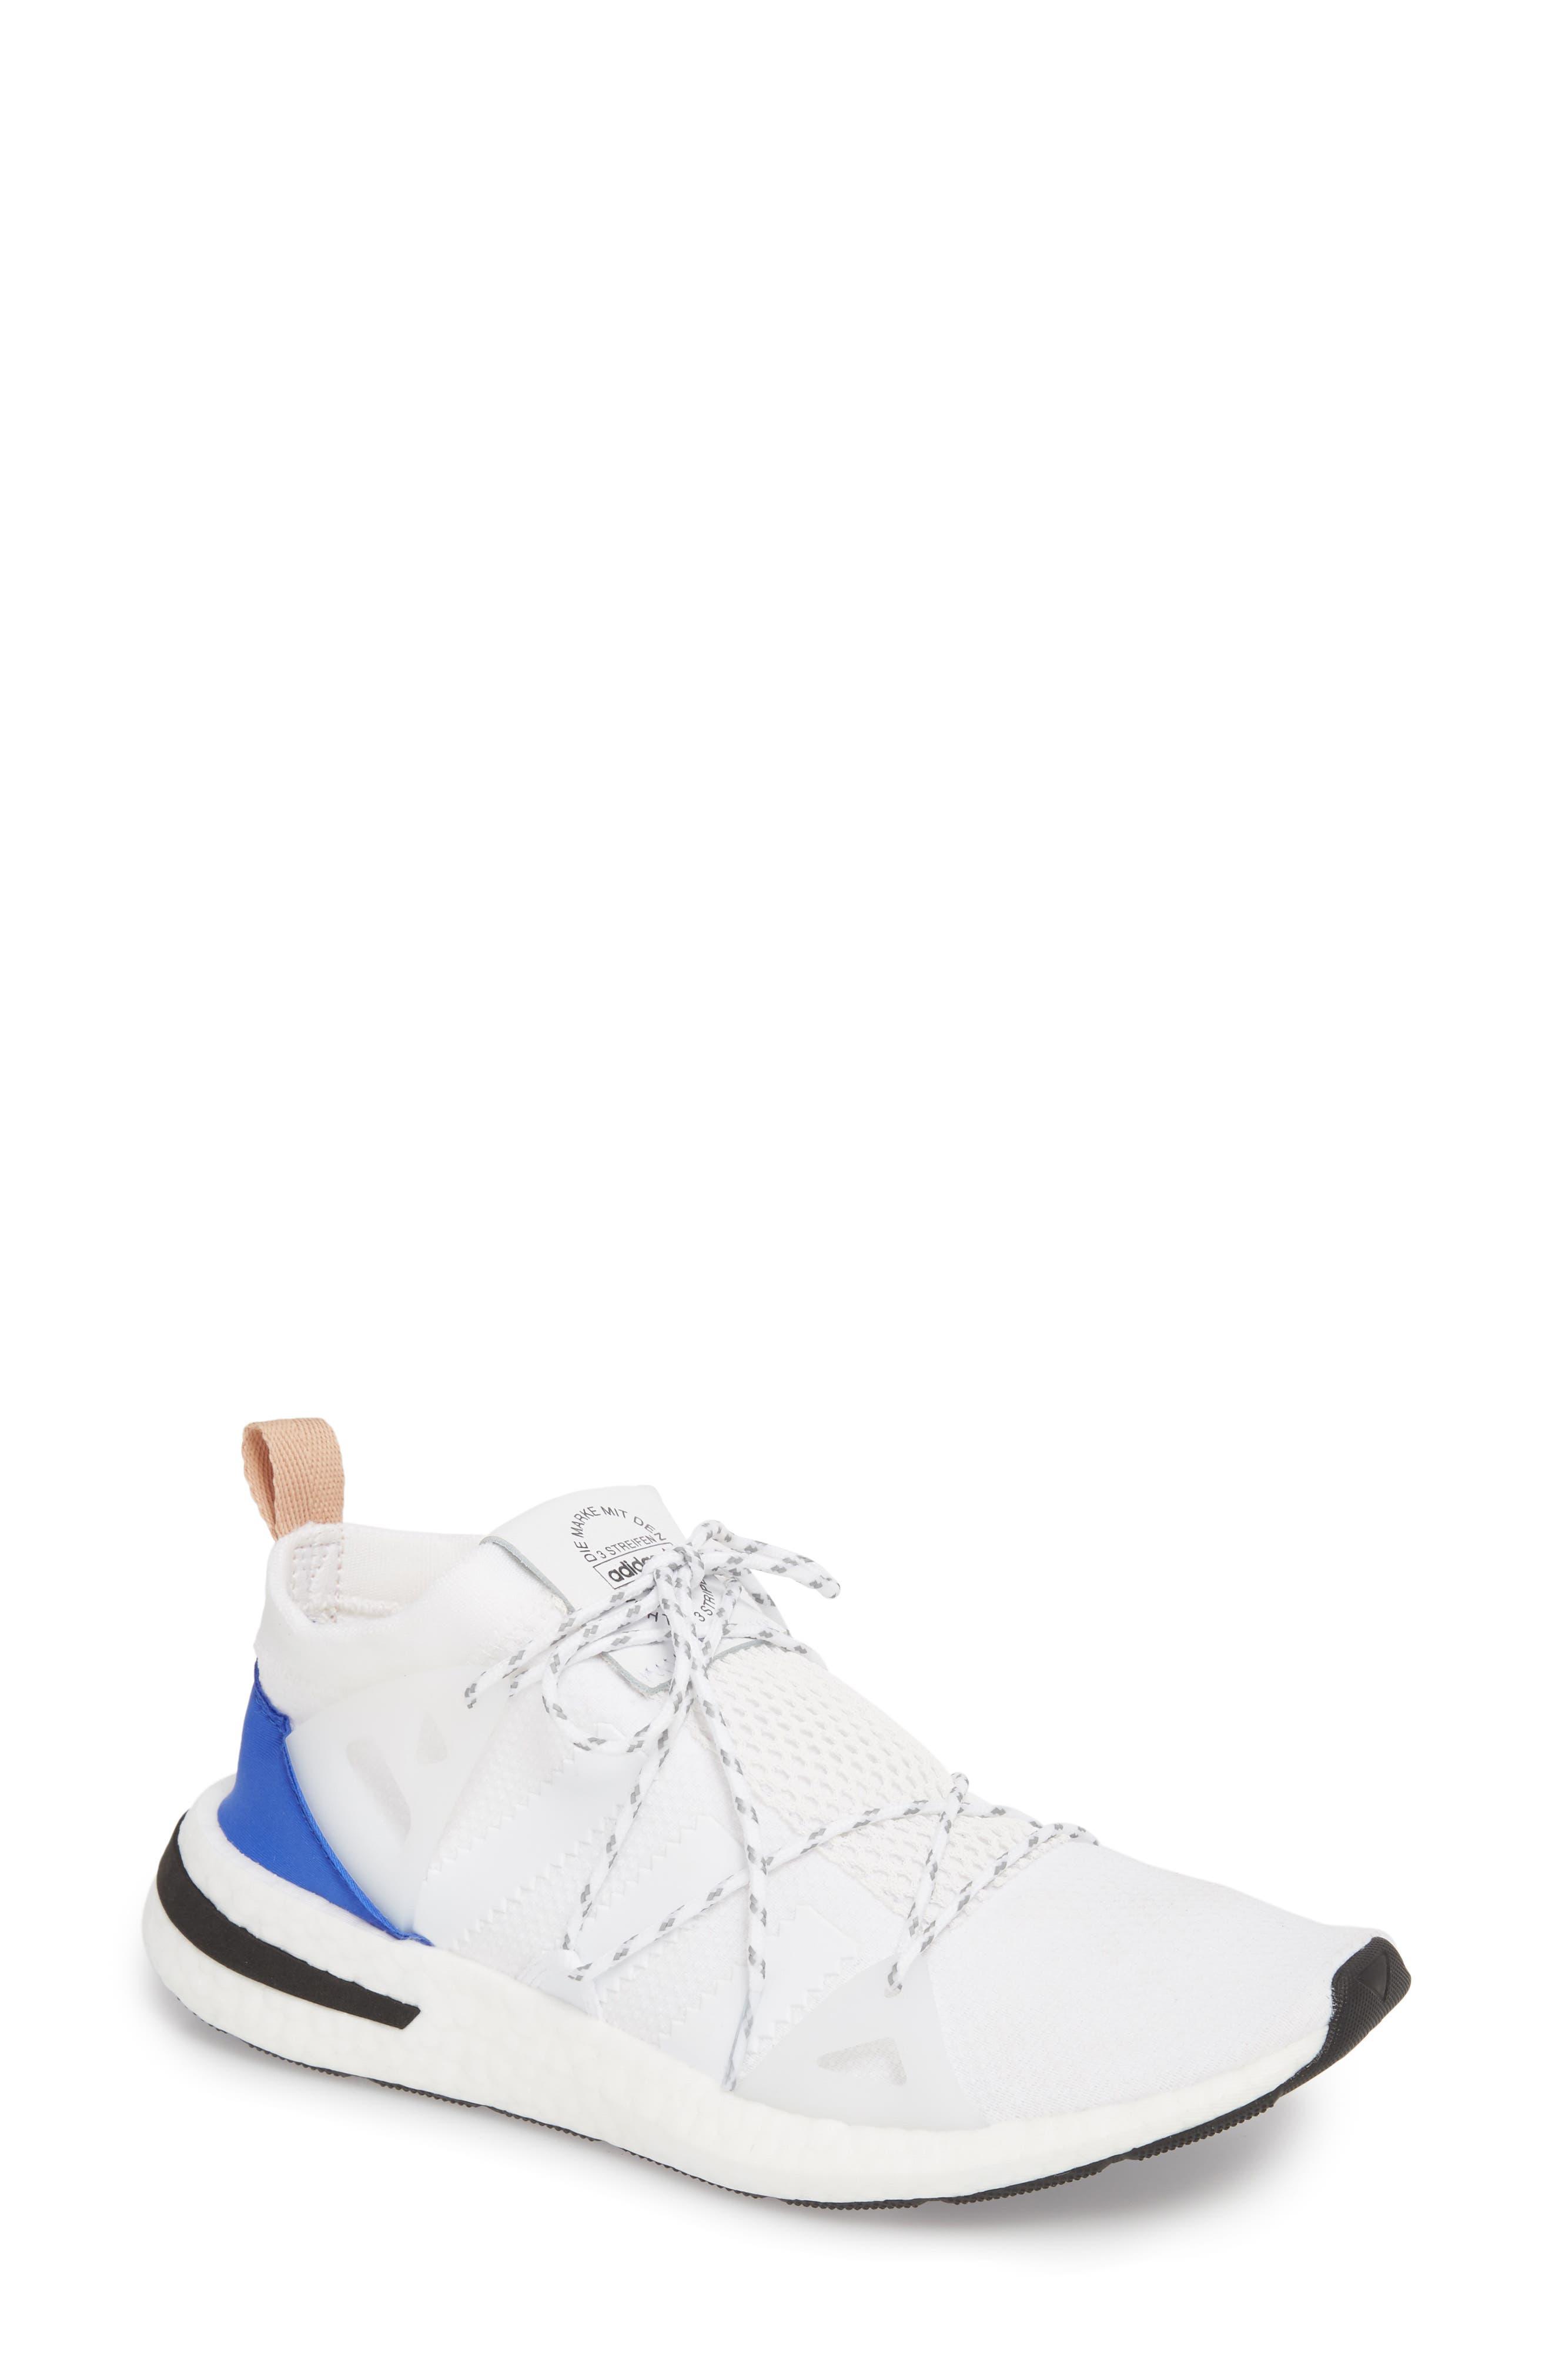 Arkyn Sneaker,                             Main thumbnail 1, color,                             White/ White/ Ash Pearl